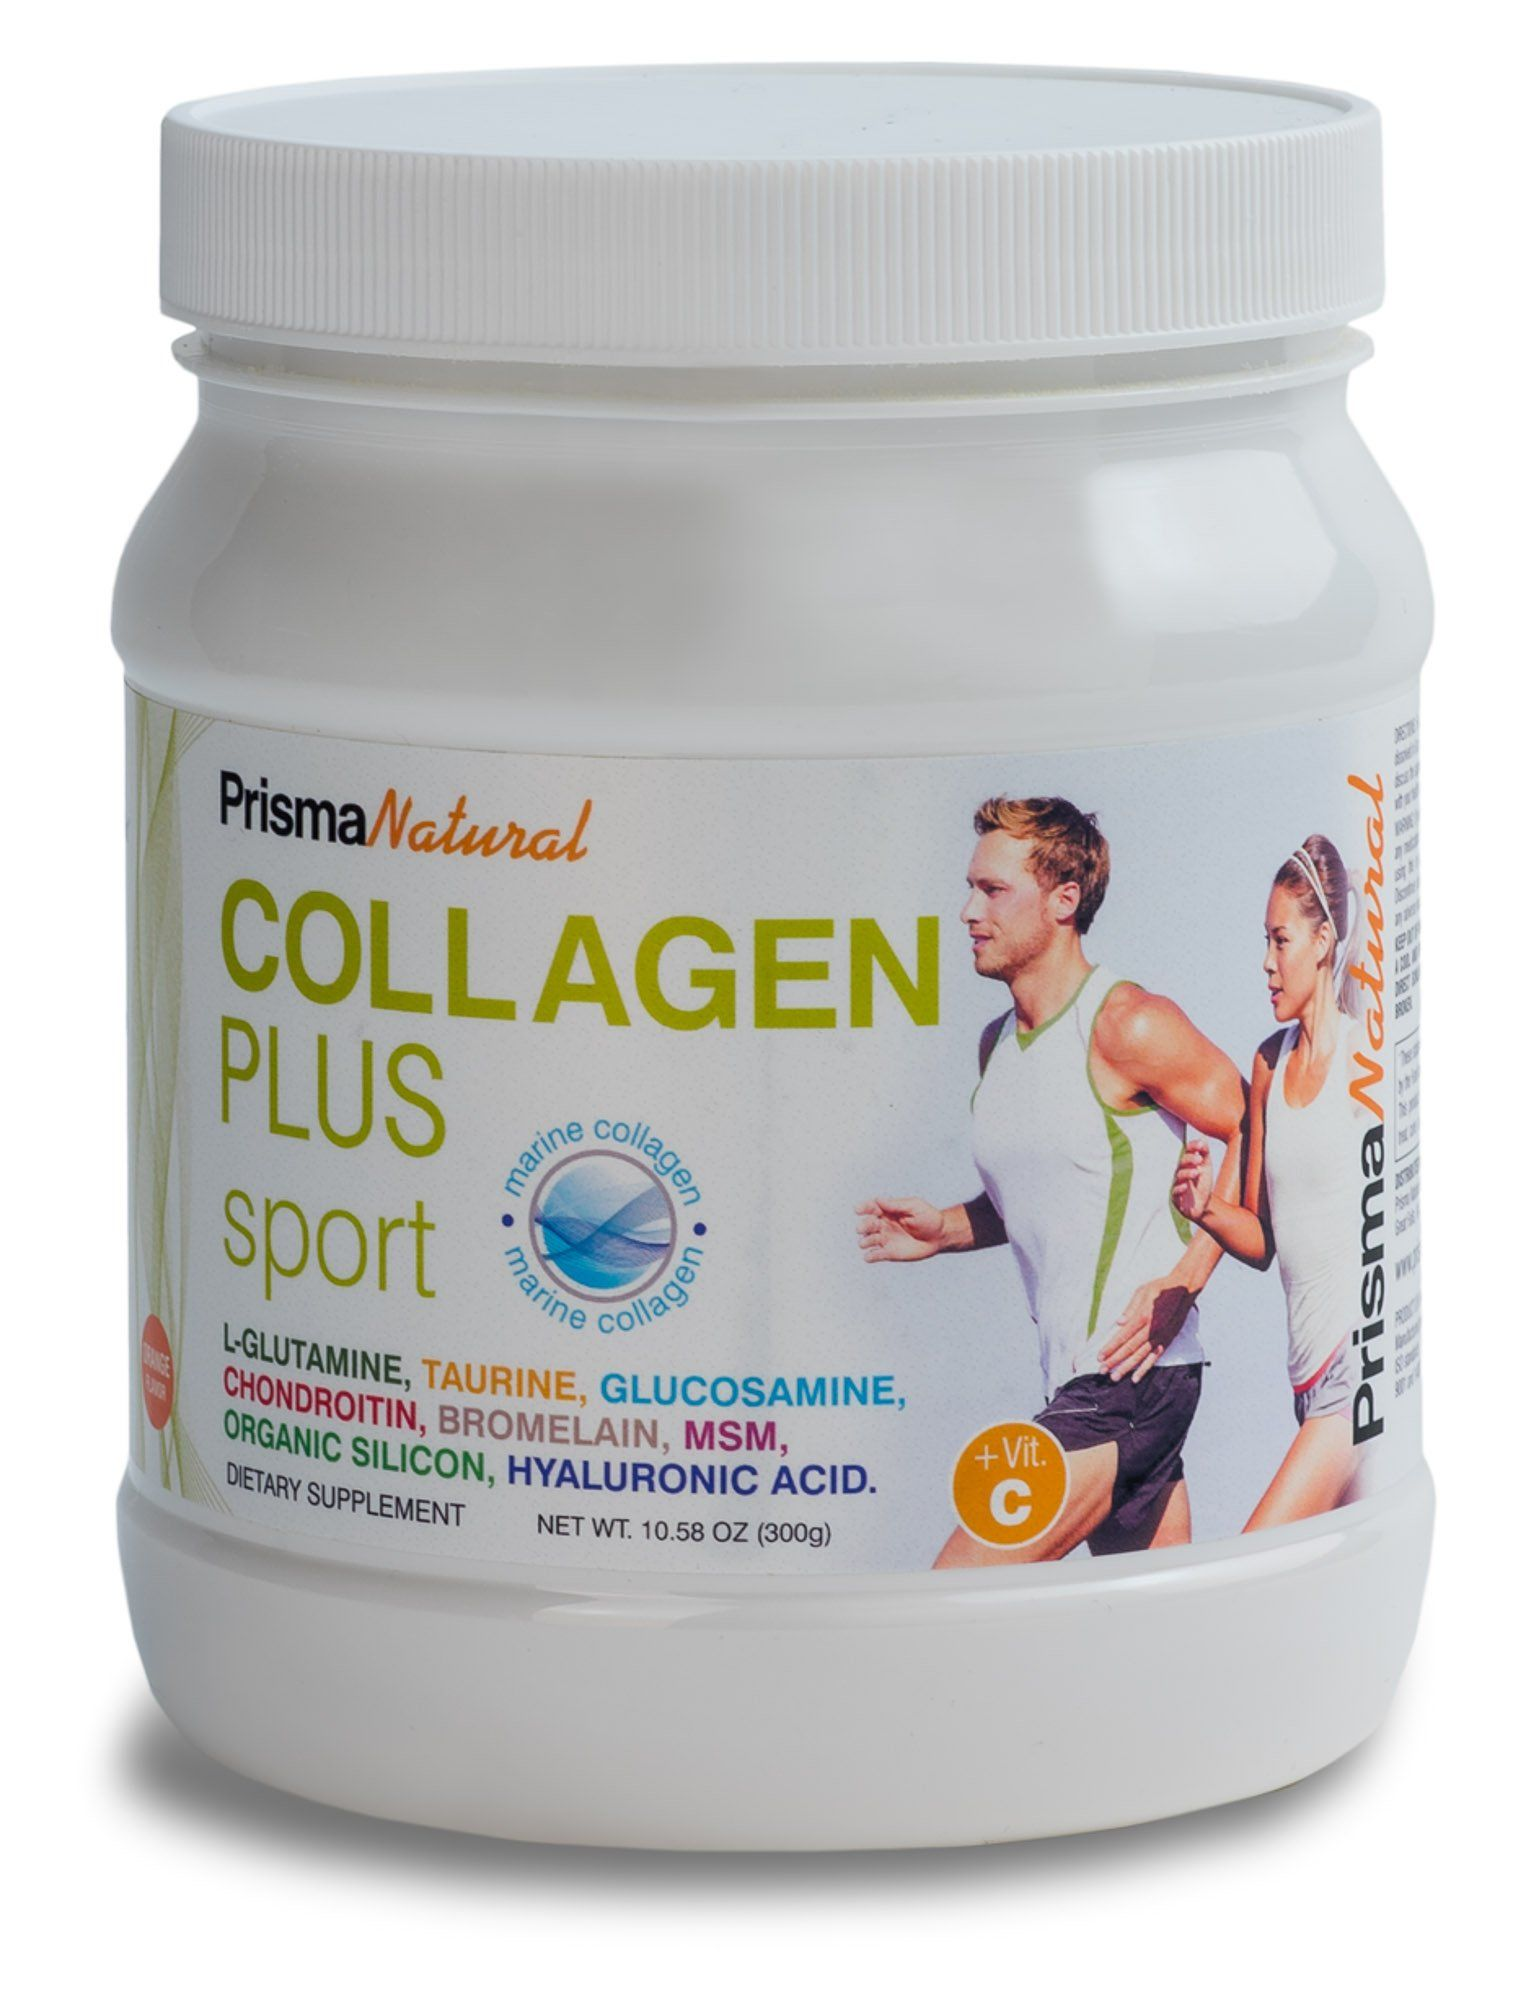 Prisma Natural Premium Collagen Plus Sport Hydrolyzed